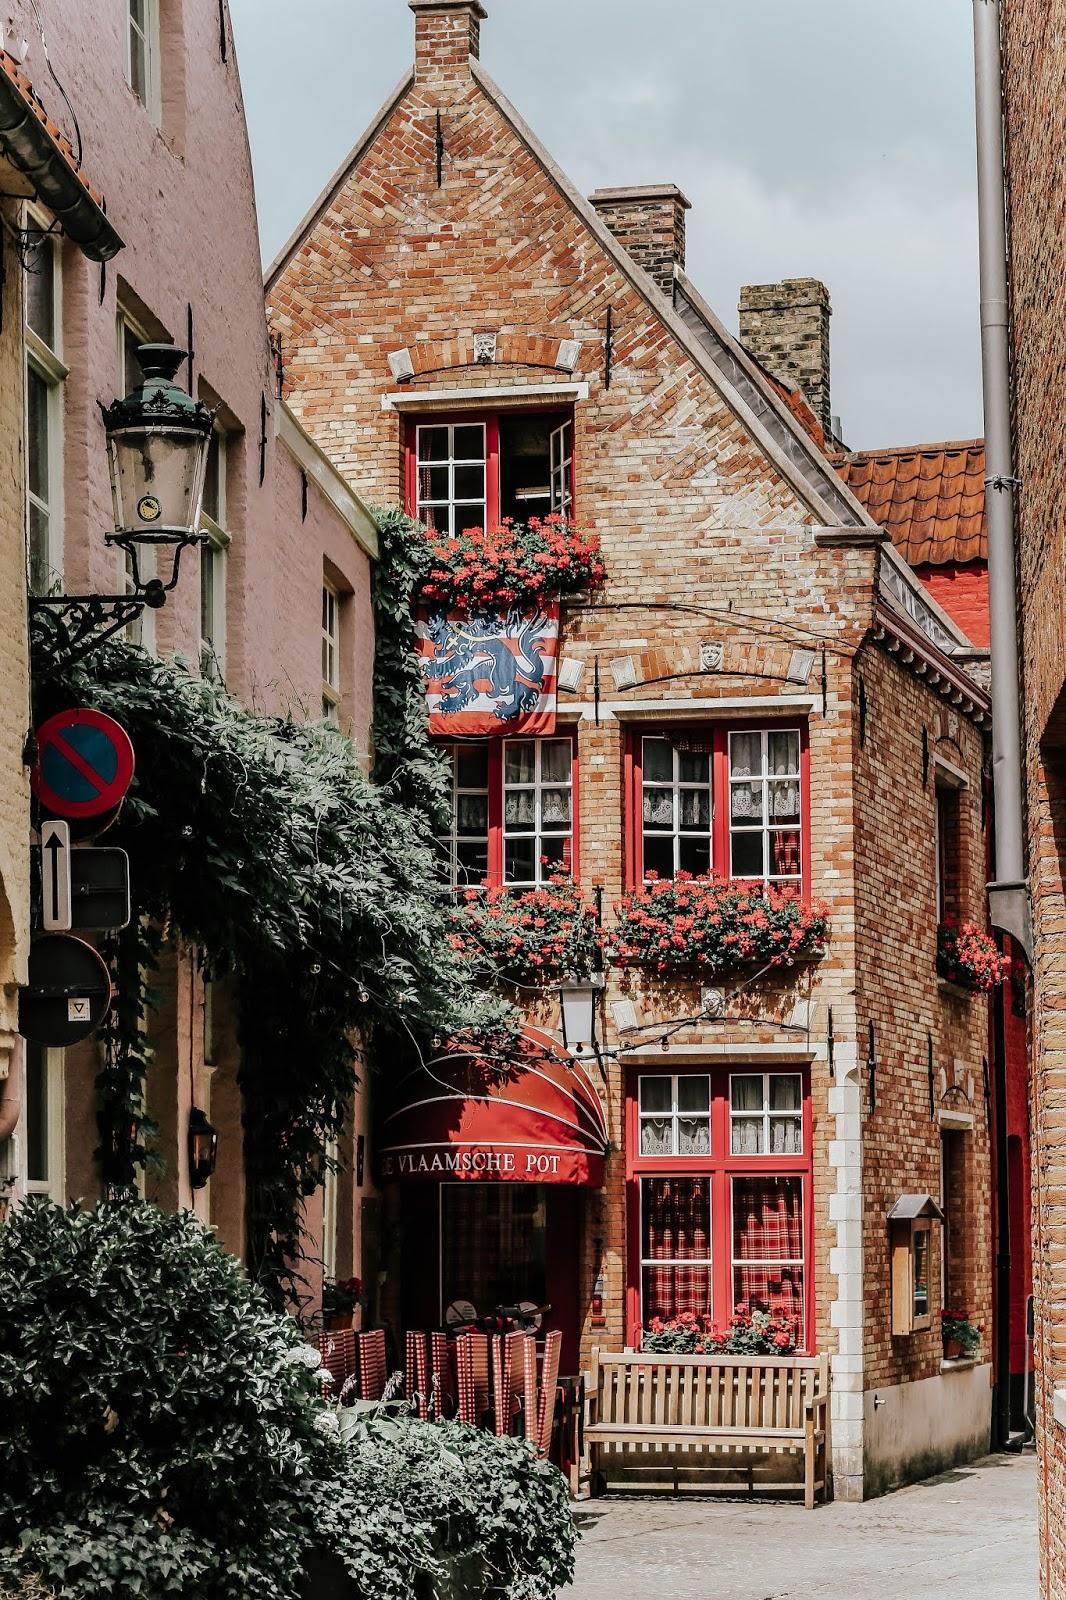 De Vlaamsche Pot Restaurant Brugge Travel Photography